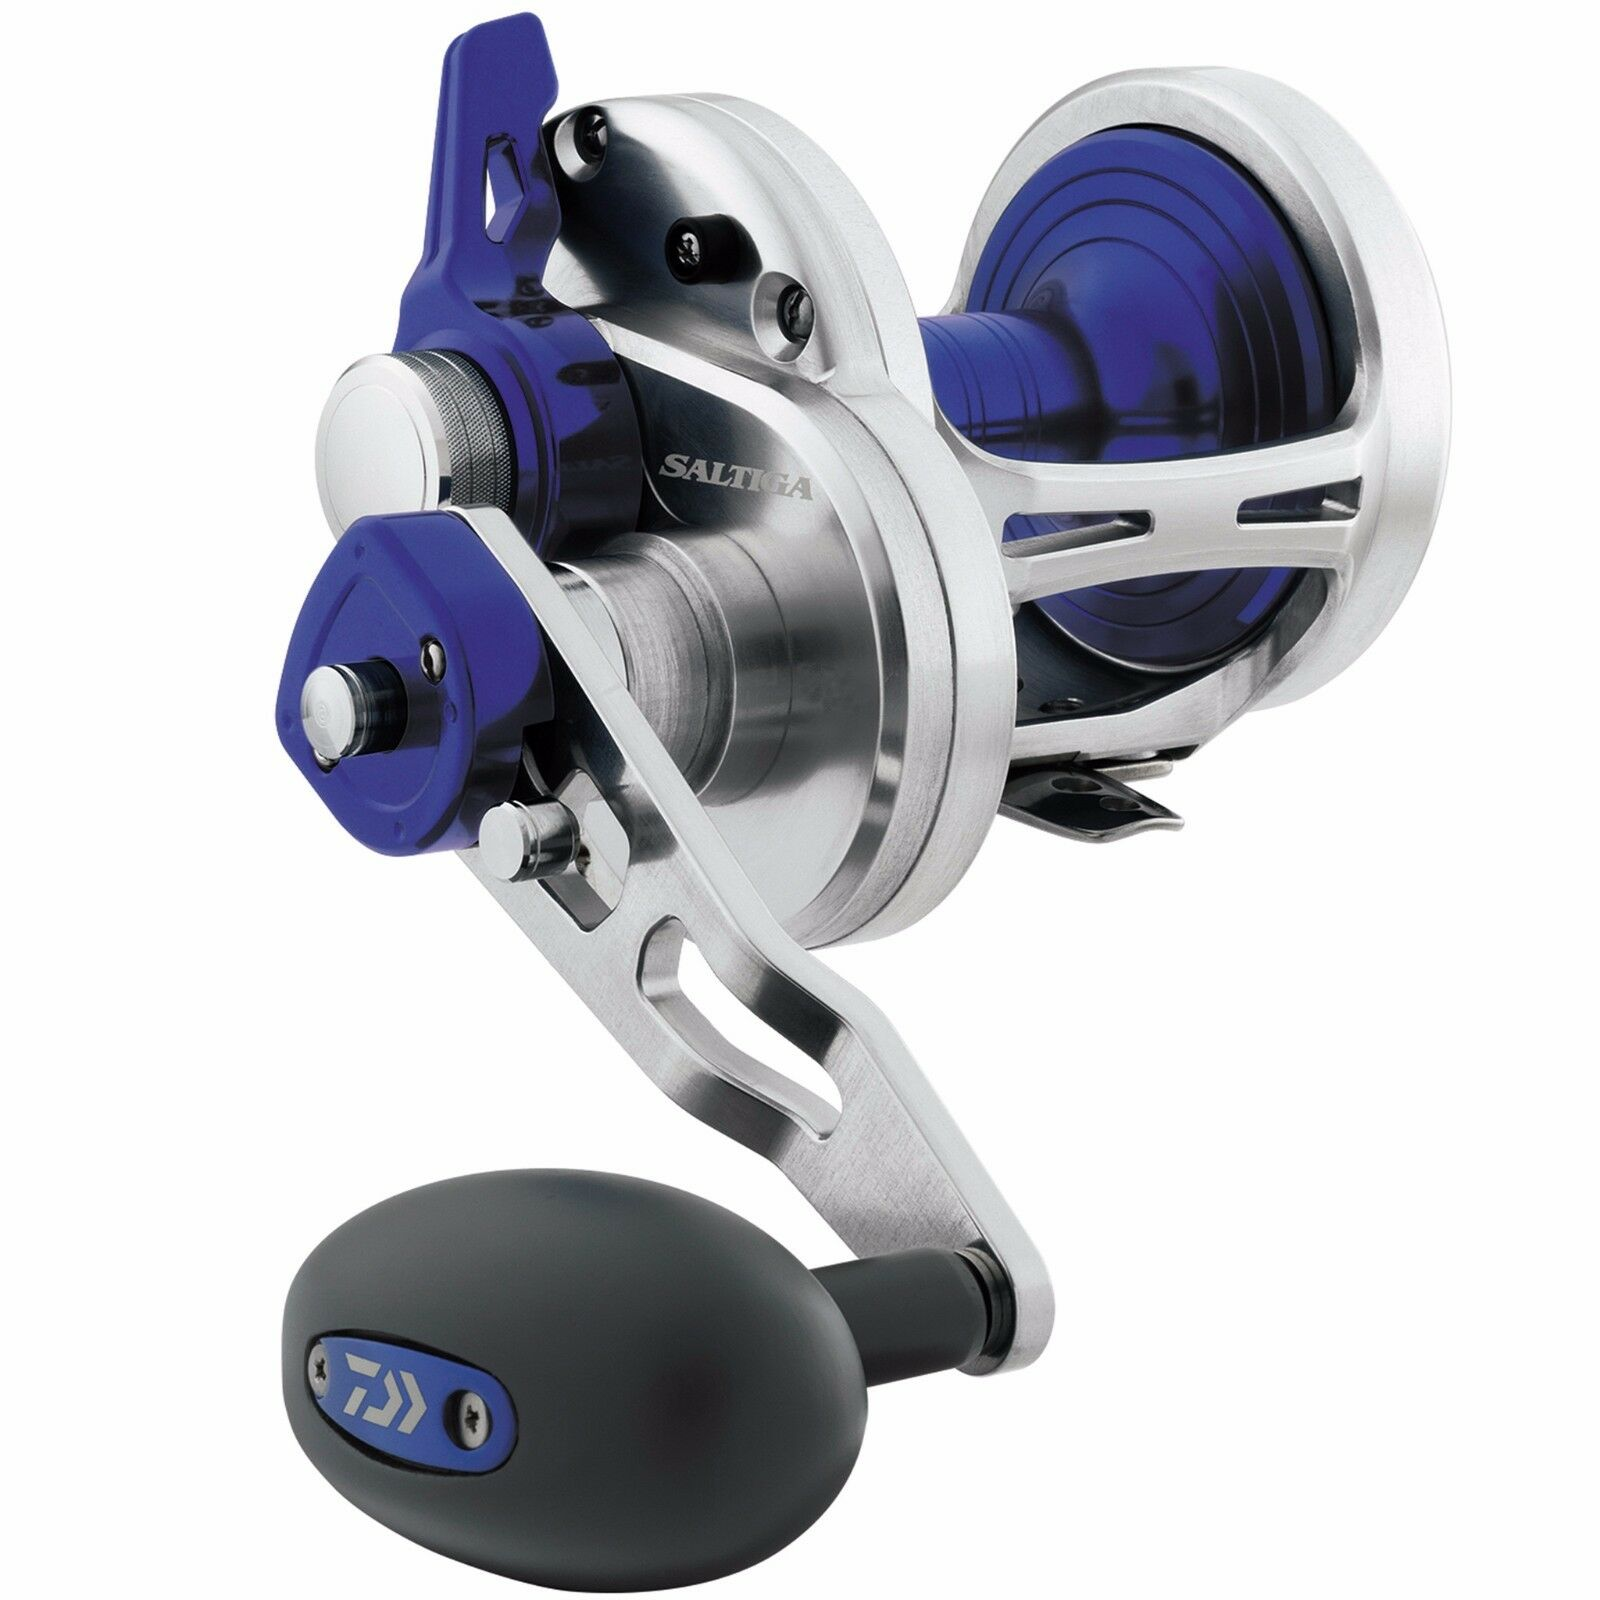 Daiwa Saltiga 2 Speed 6.3  1   3.1 1 Lever Drag Fishing Reel - SALD40-2SPD  order now